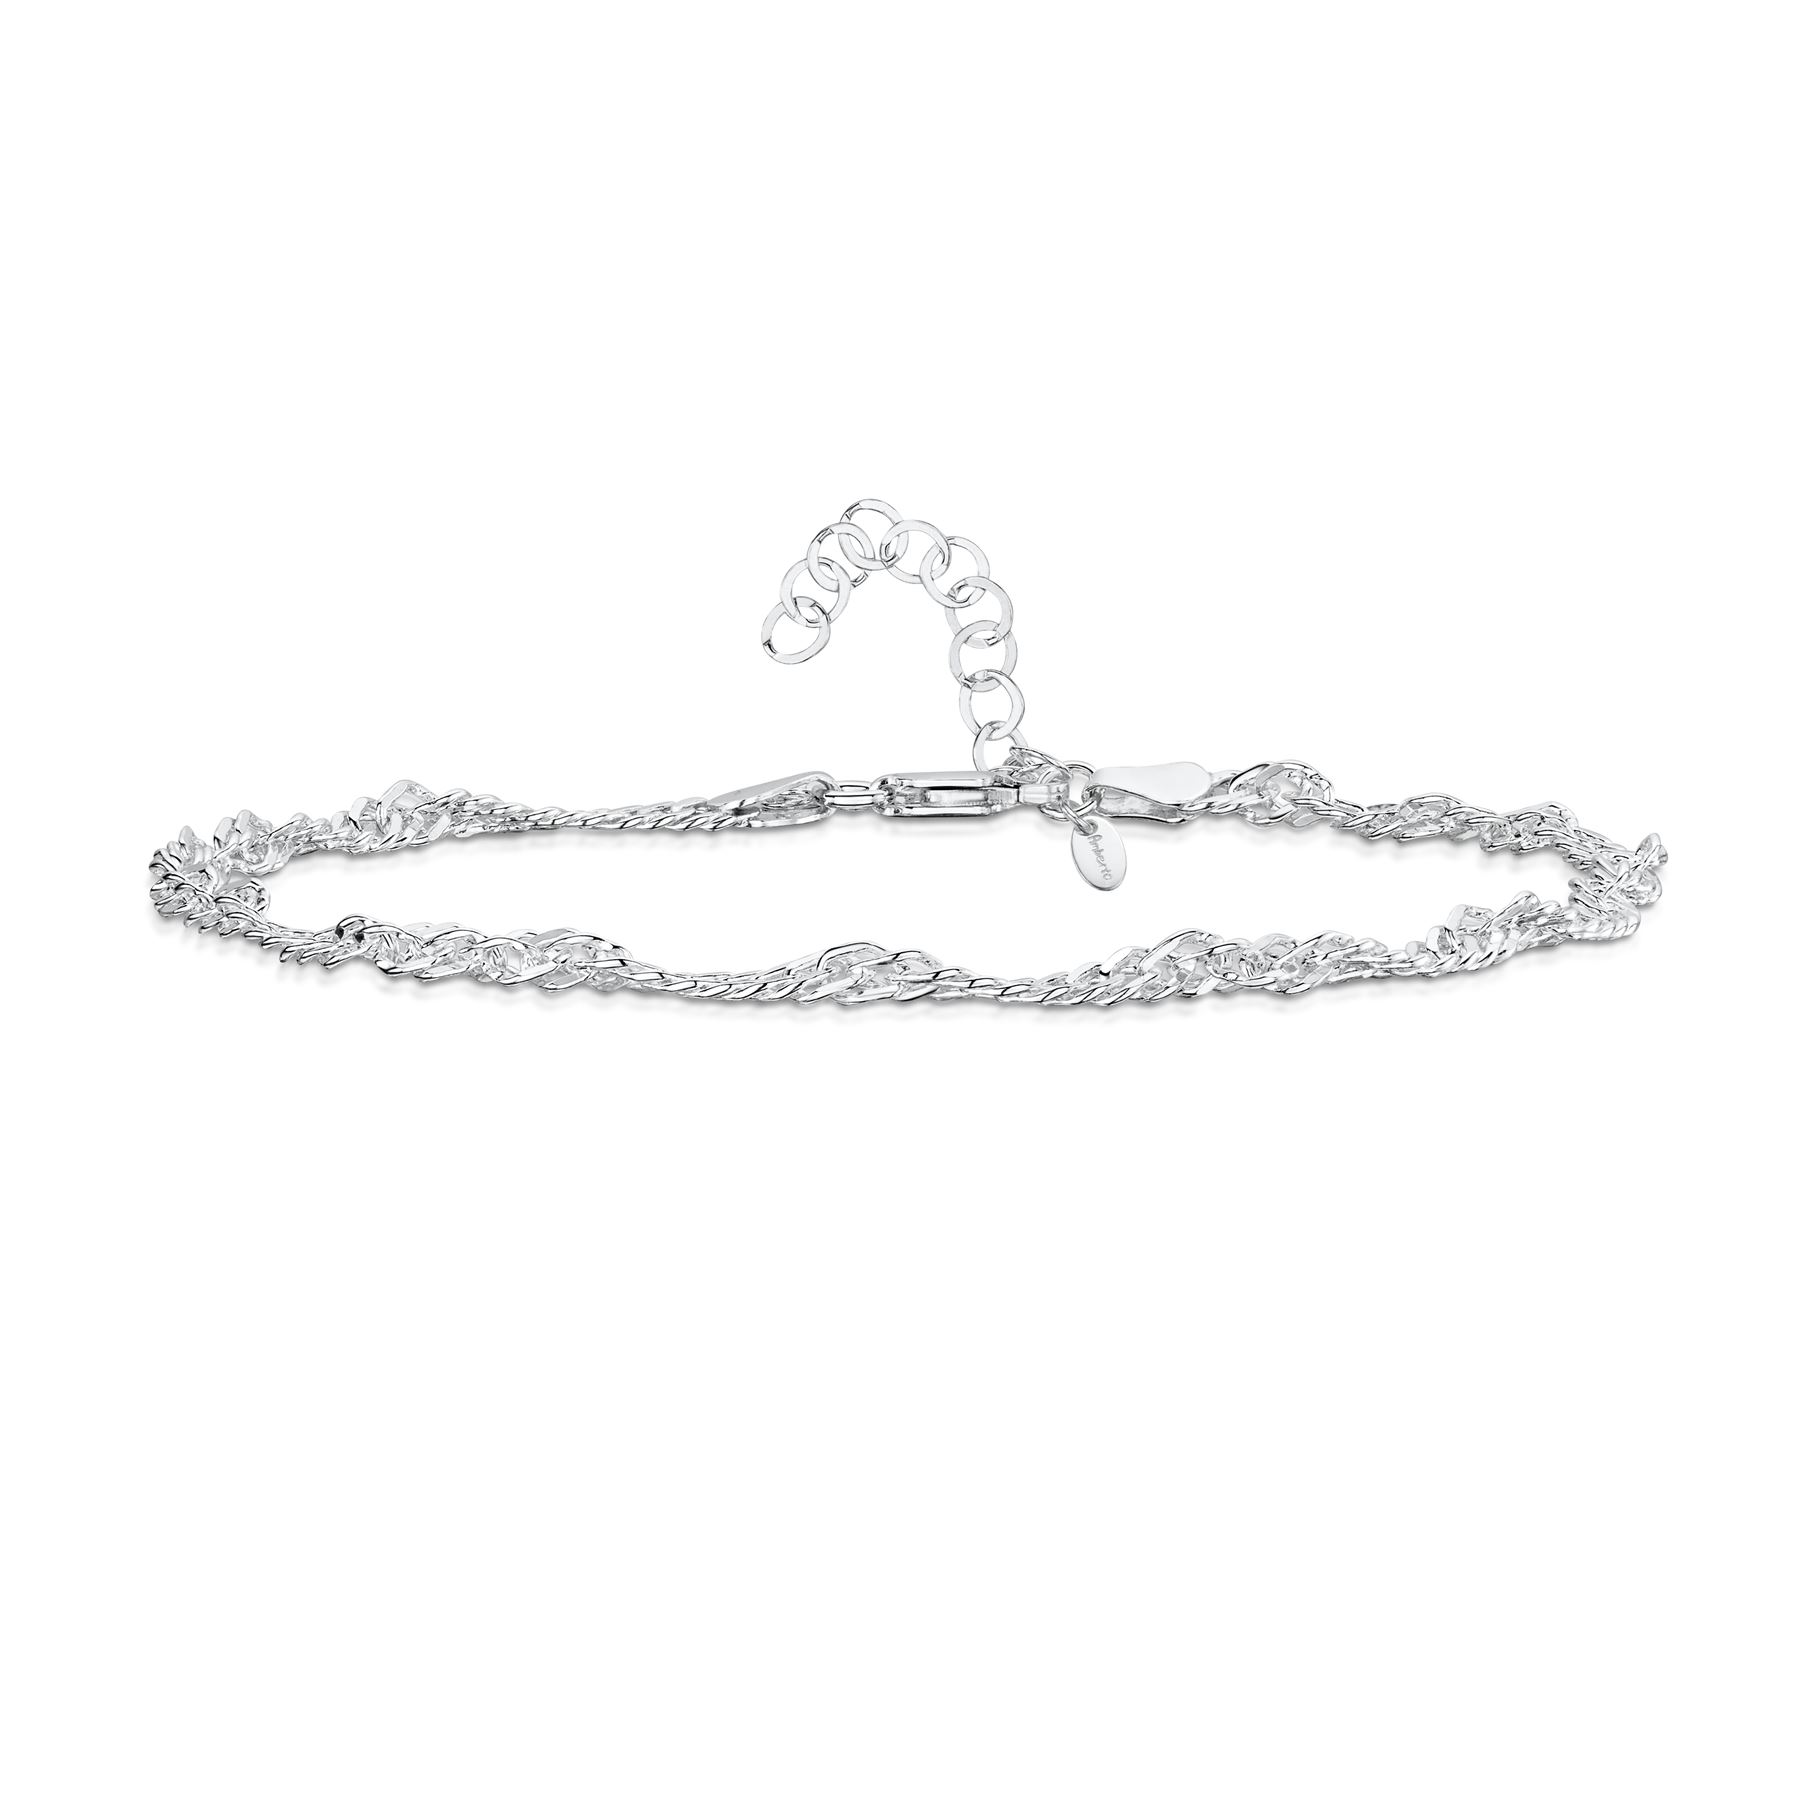 Amberta-Jewelry-925-Sterling-Silver-Adjustable-Anklet-Foot-Bracelet-for-Women miniature 48